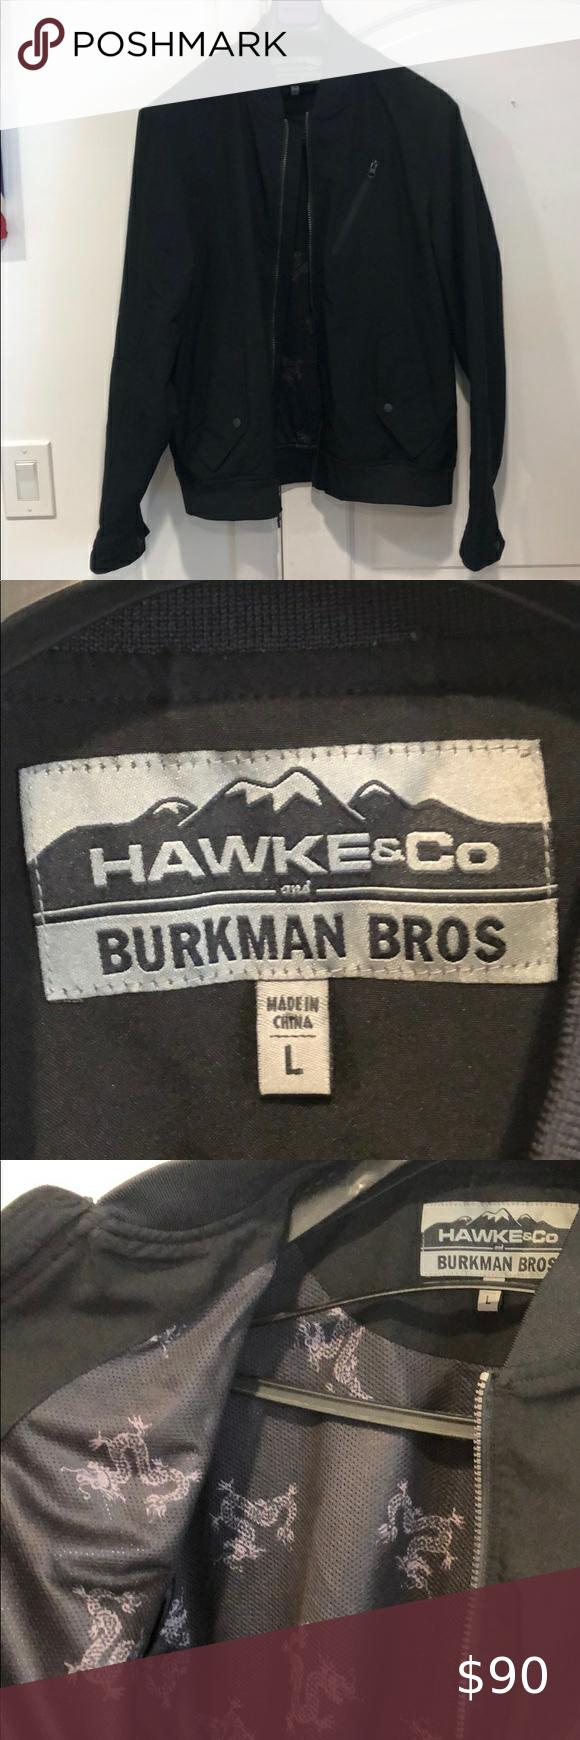 Hawke Co And Burkman Bros Black Bomber Jacket Black Bomber Jacket Stylish Jackets Black Bomber [ 1740 x 580 Pixel ]